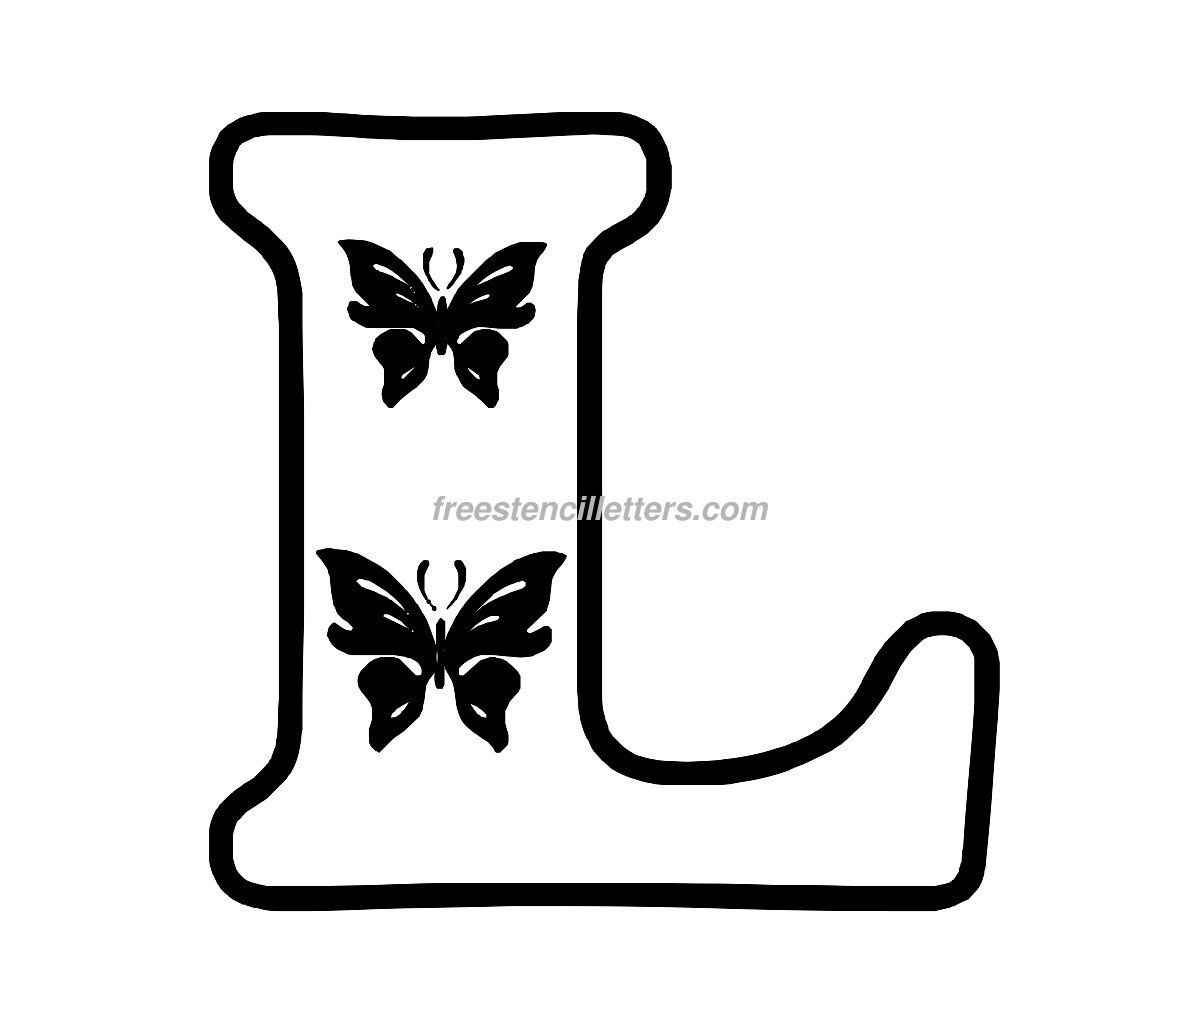 Print L Letter Stencil - Free Stencil Letters - Free Printable Alphabet Stencils To Cut Out